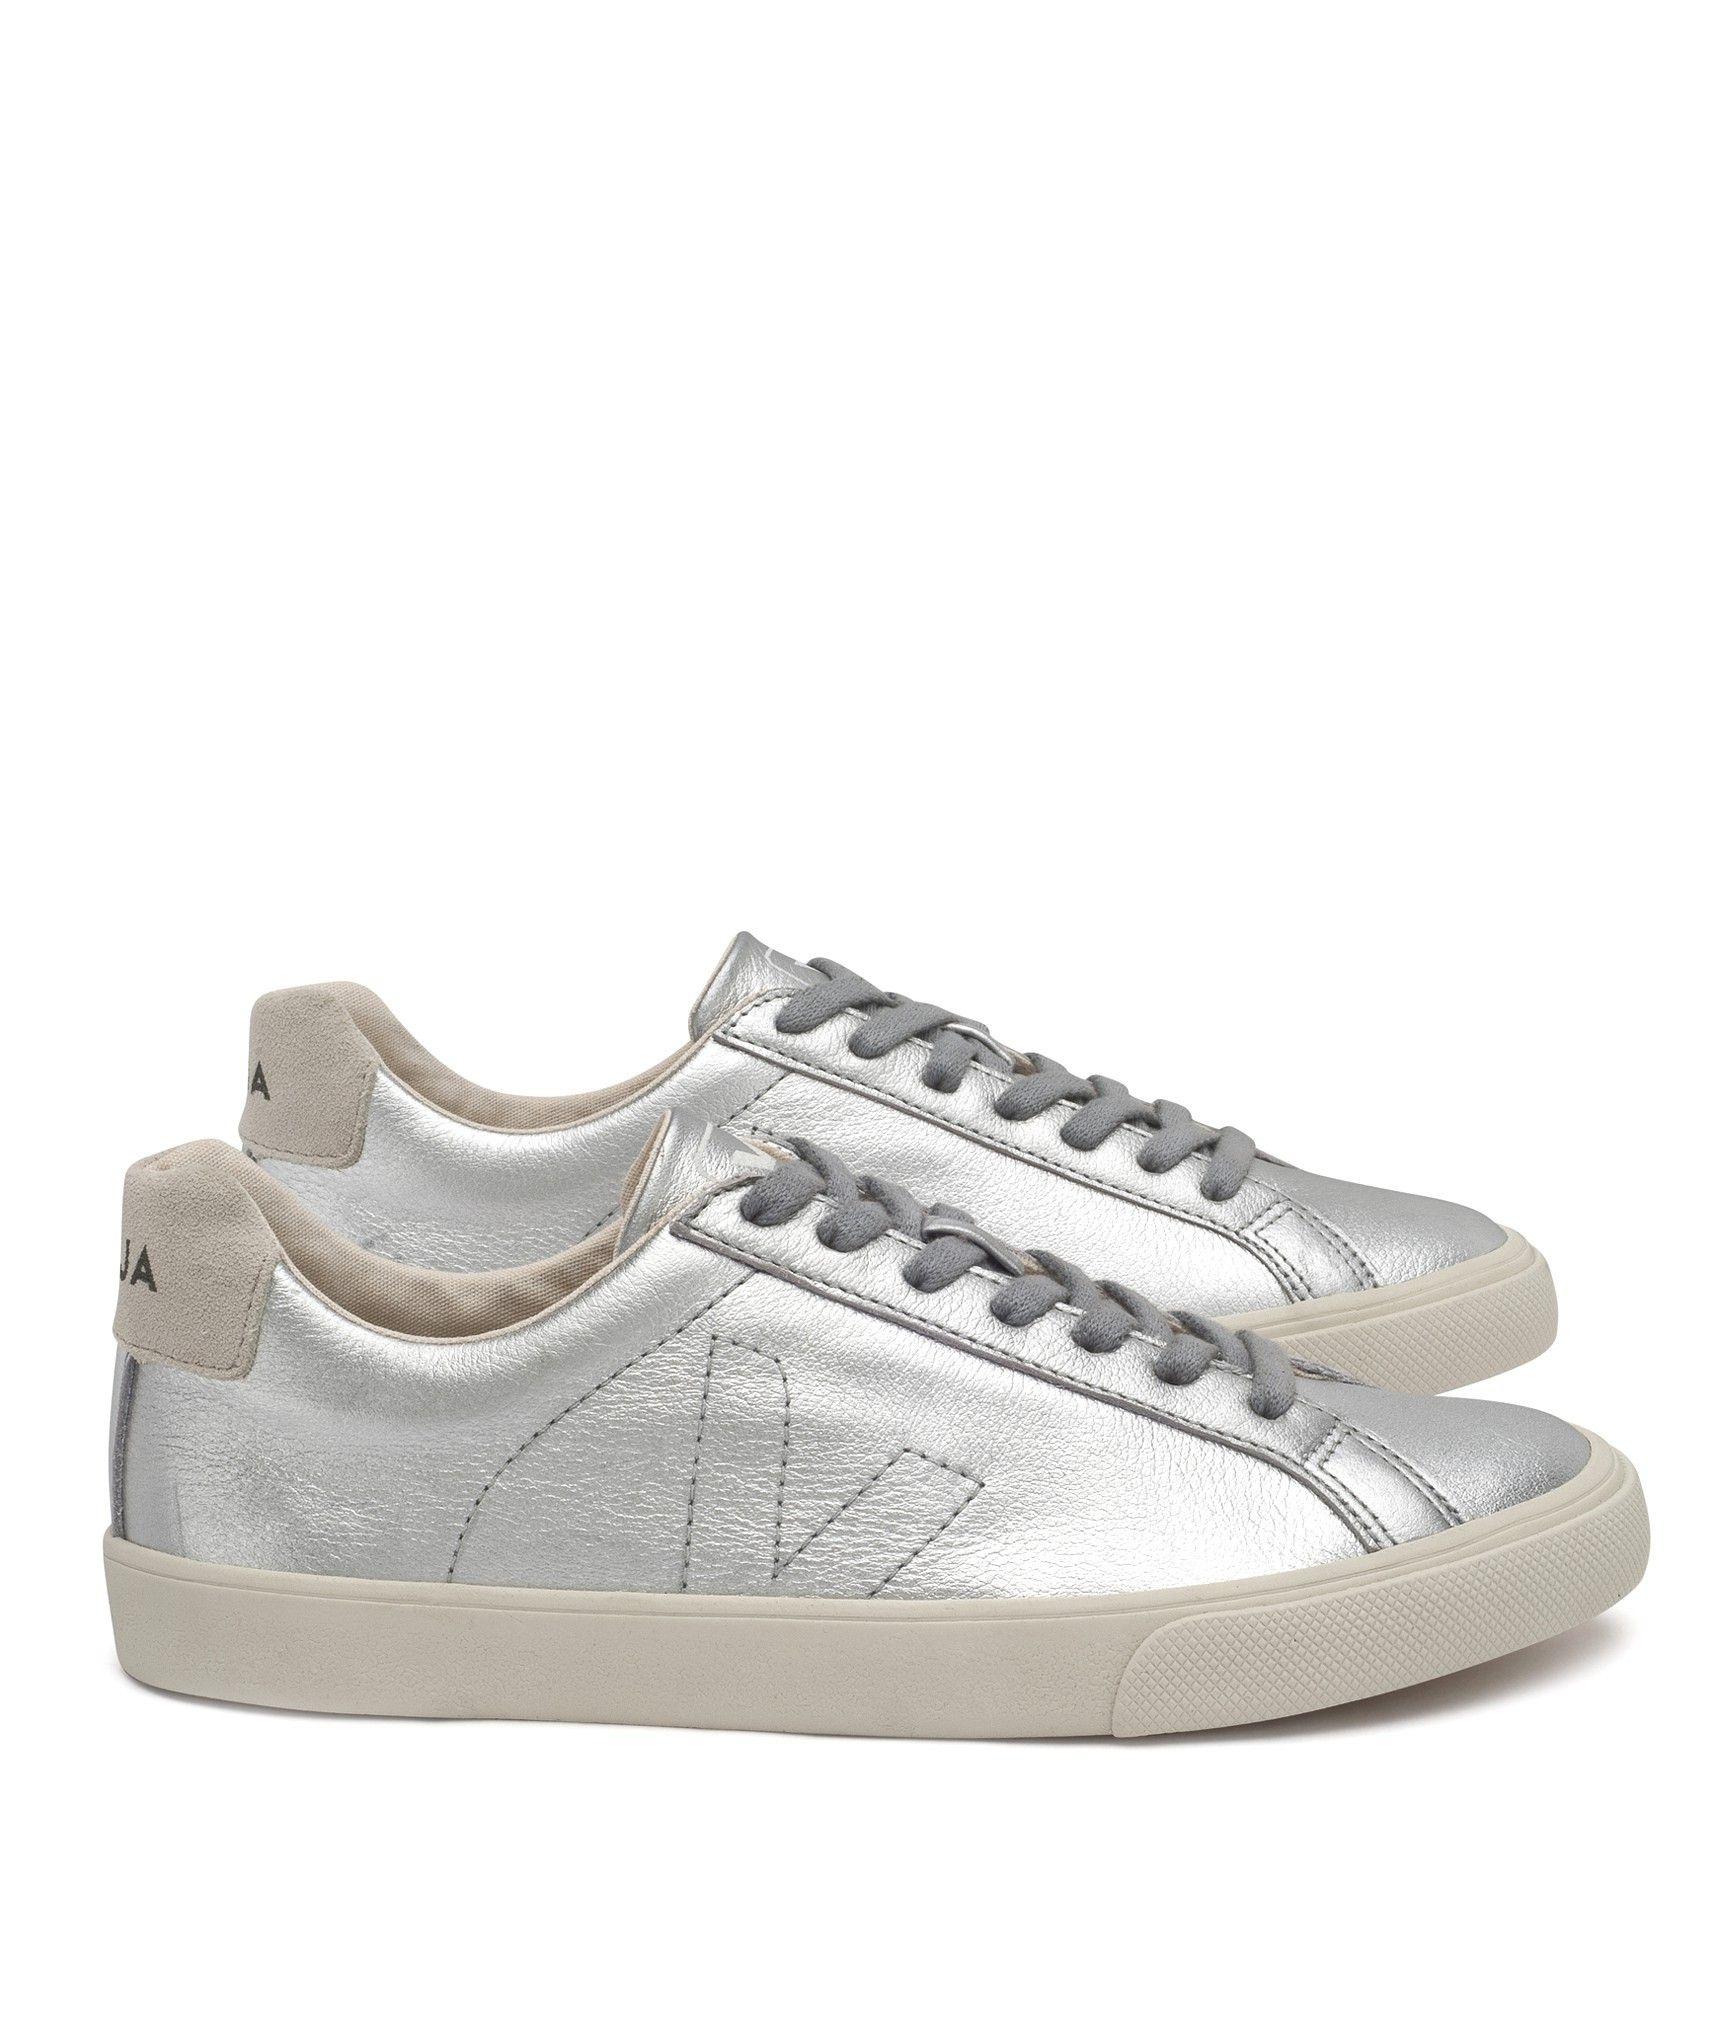 Veja Esplar Low Leather Silver Pierre